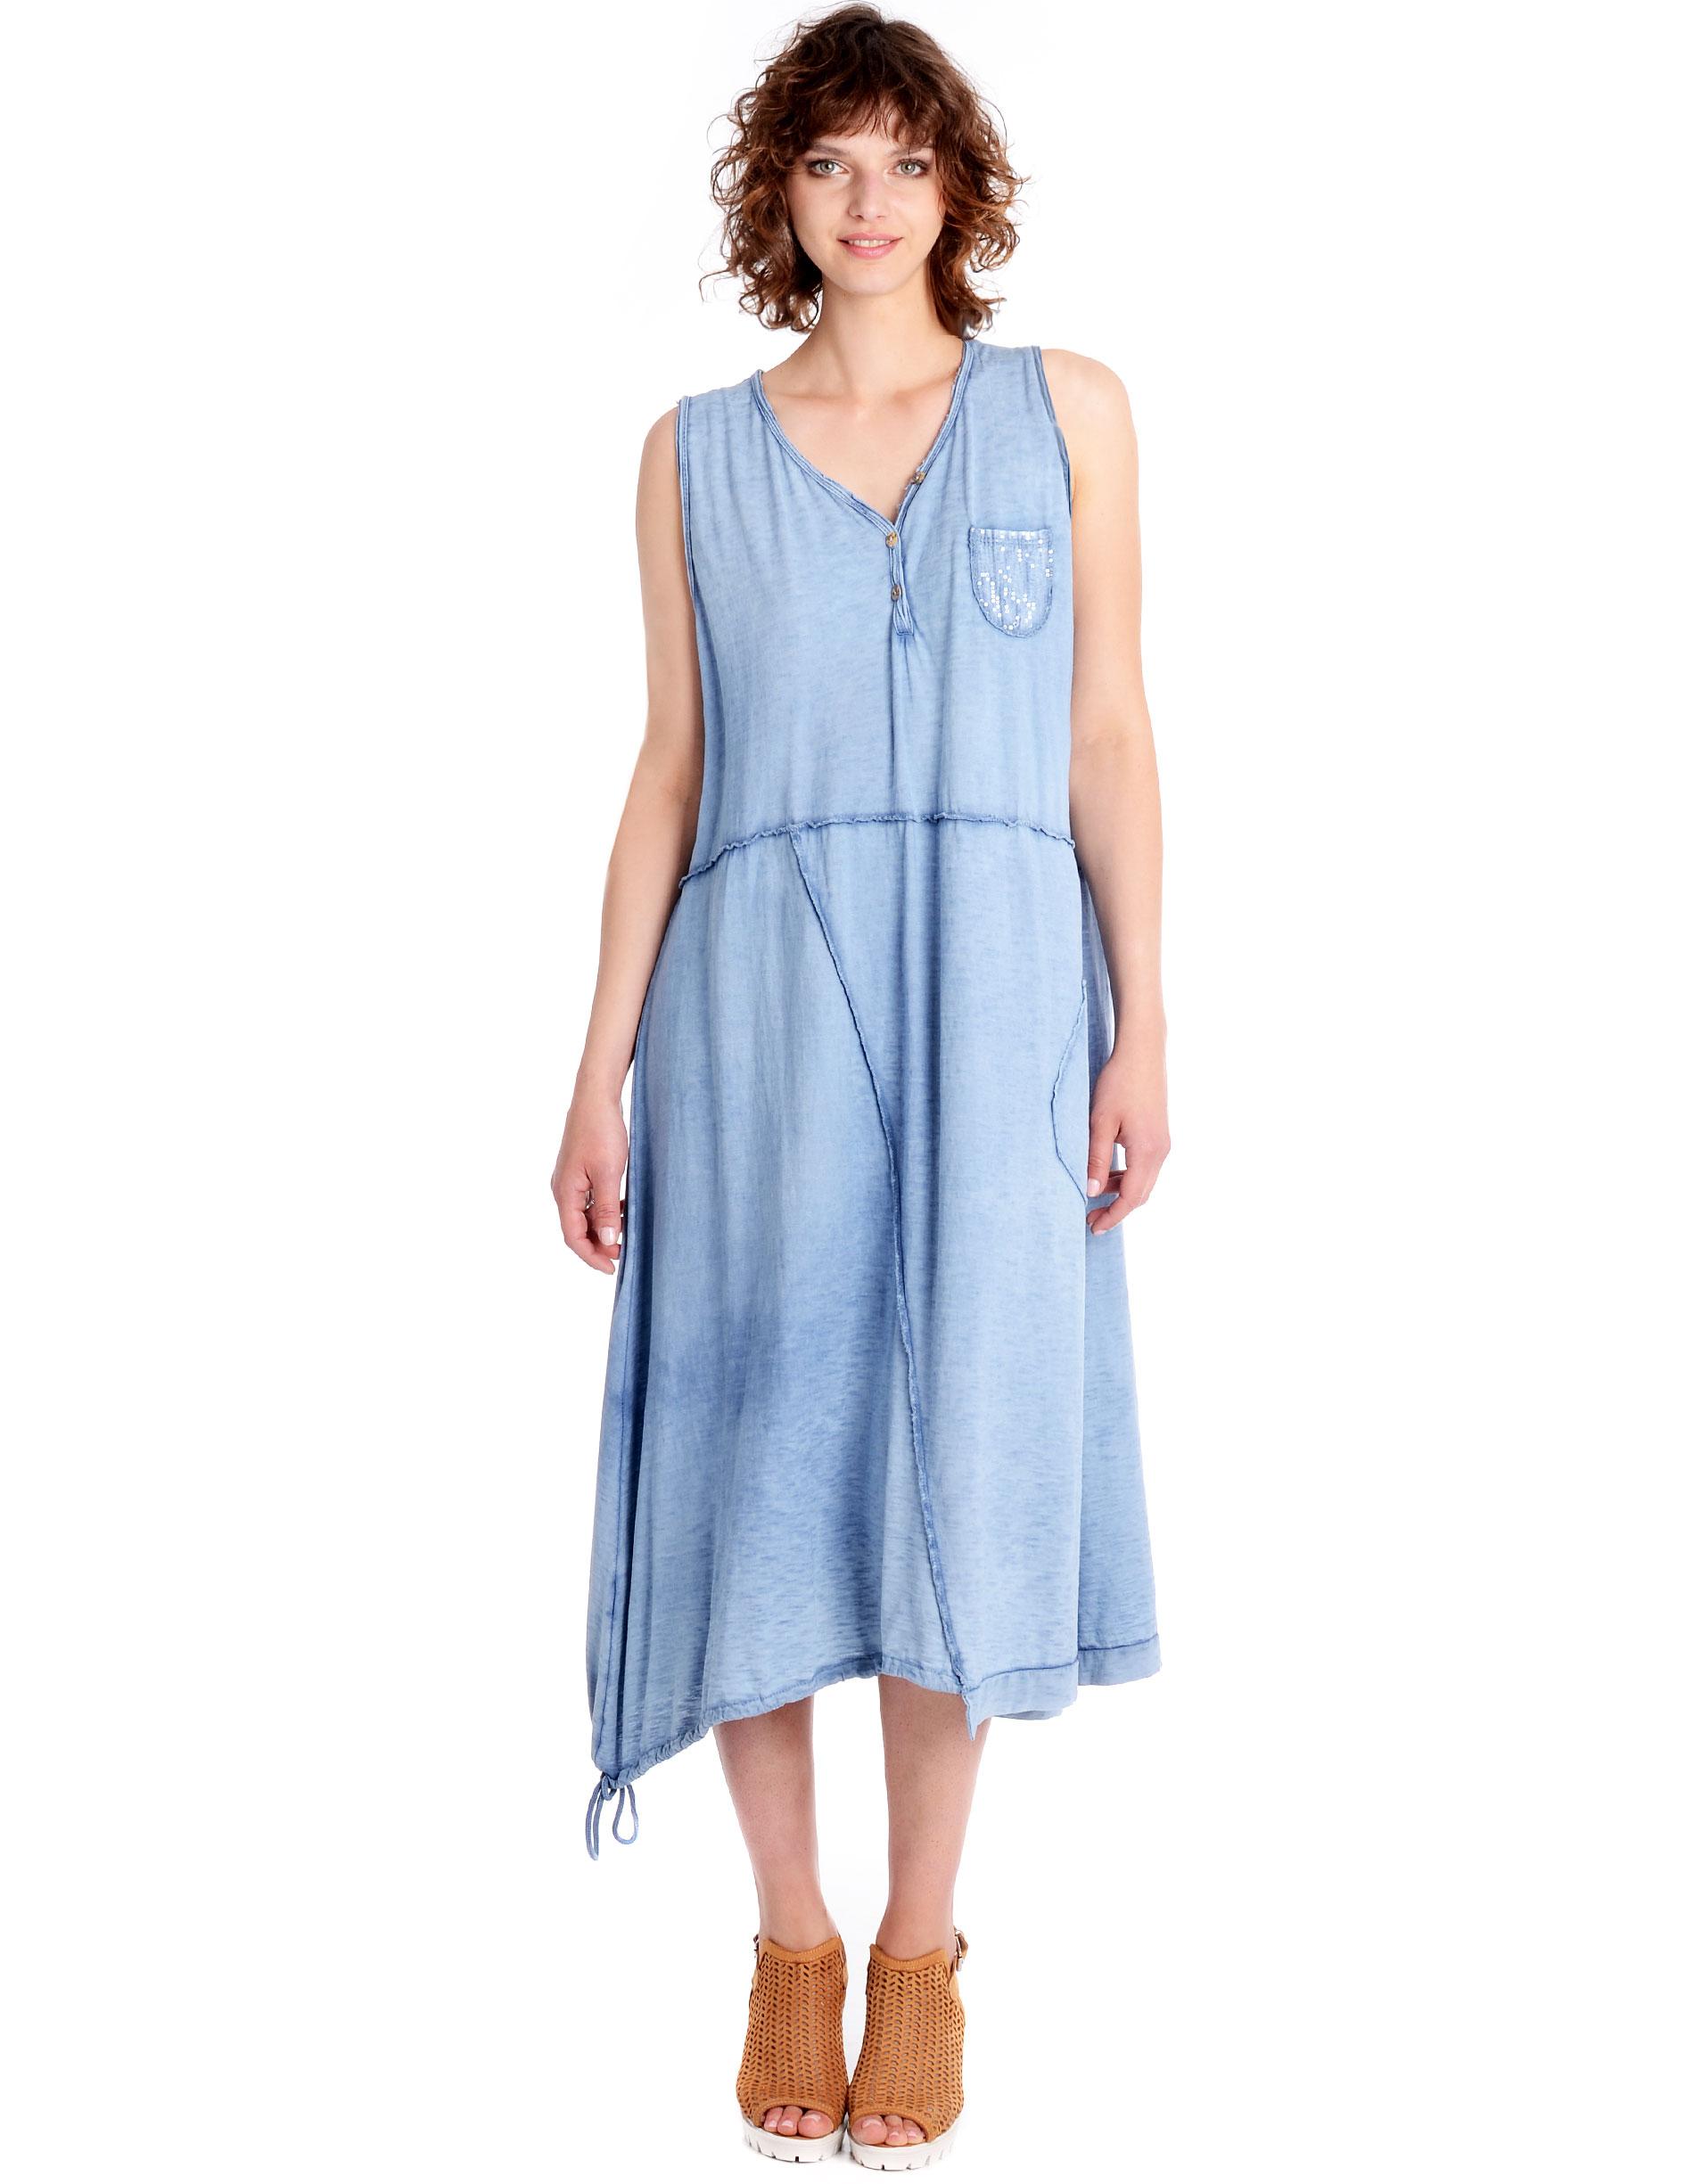 Sukienka - 32-5569 JEANS - Unisono